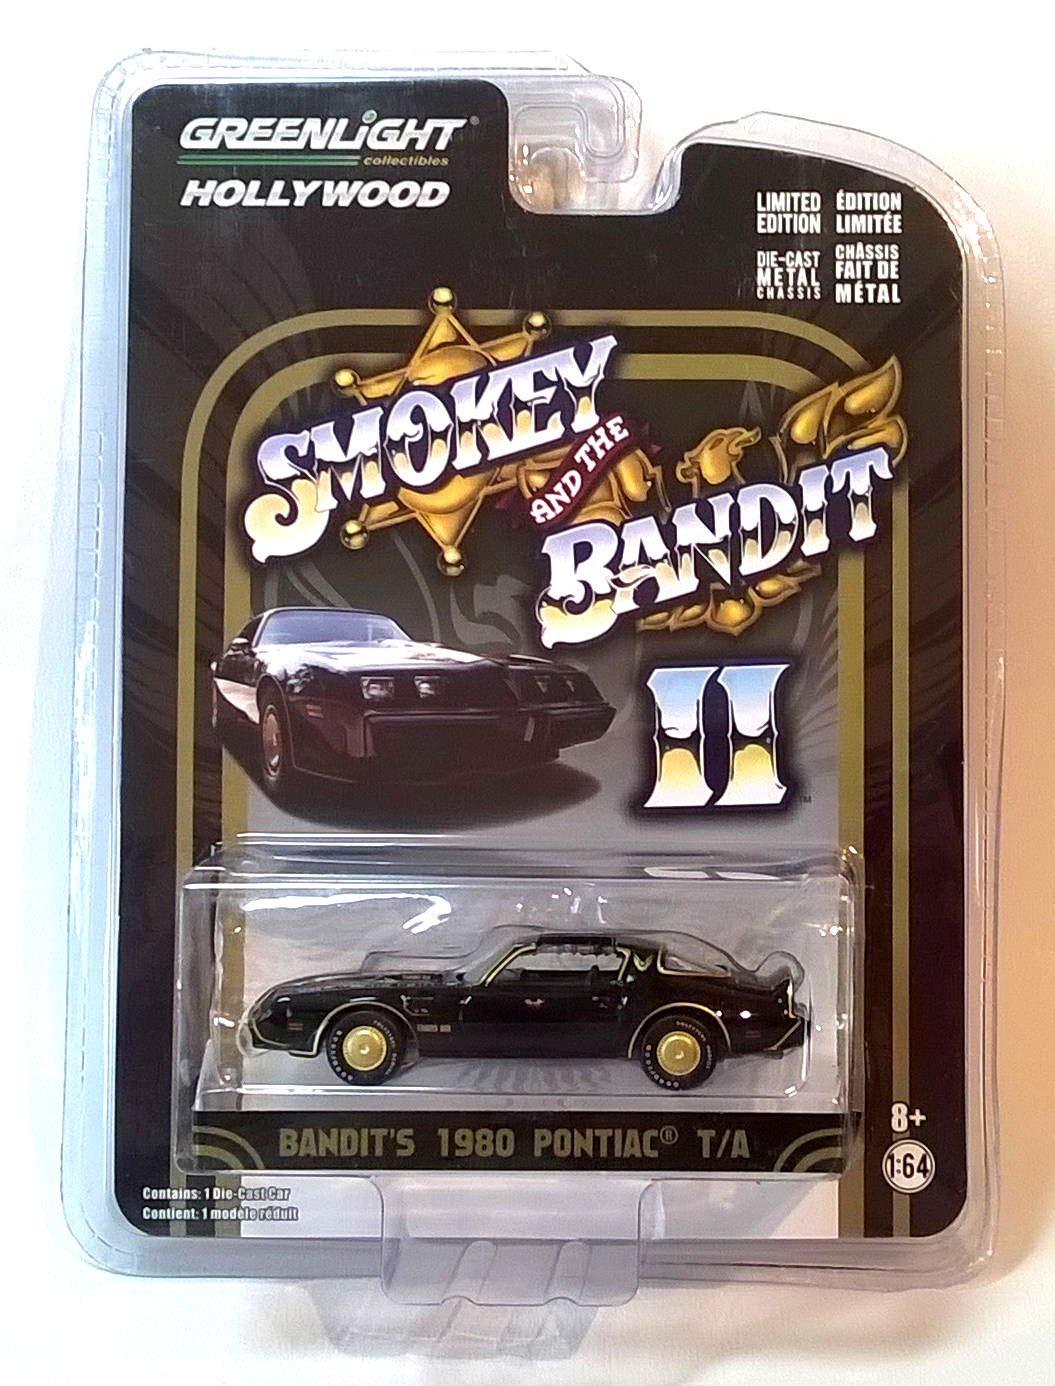 Greenlight Hollywood Smokey and the Bandit Pontiac 1977 T//A-modello di auto 1:64